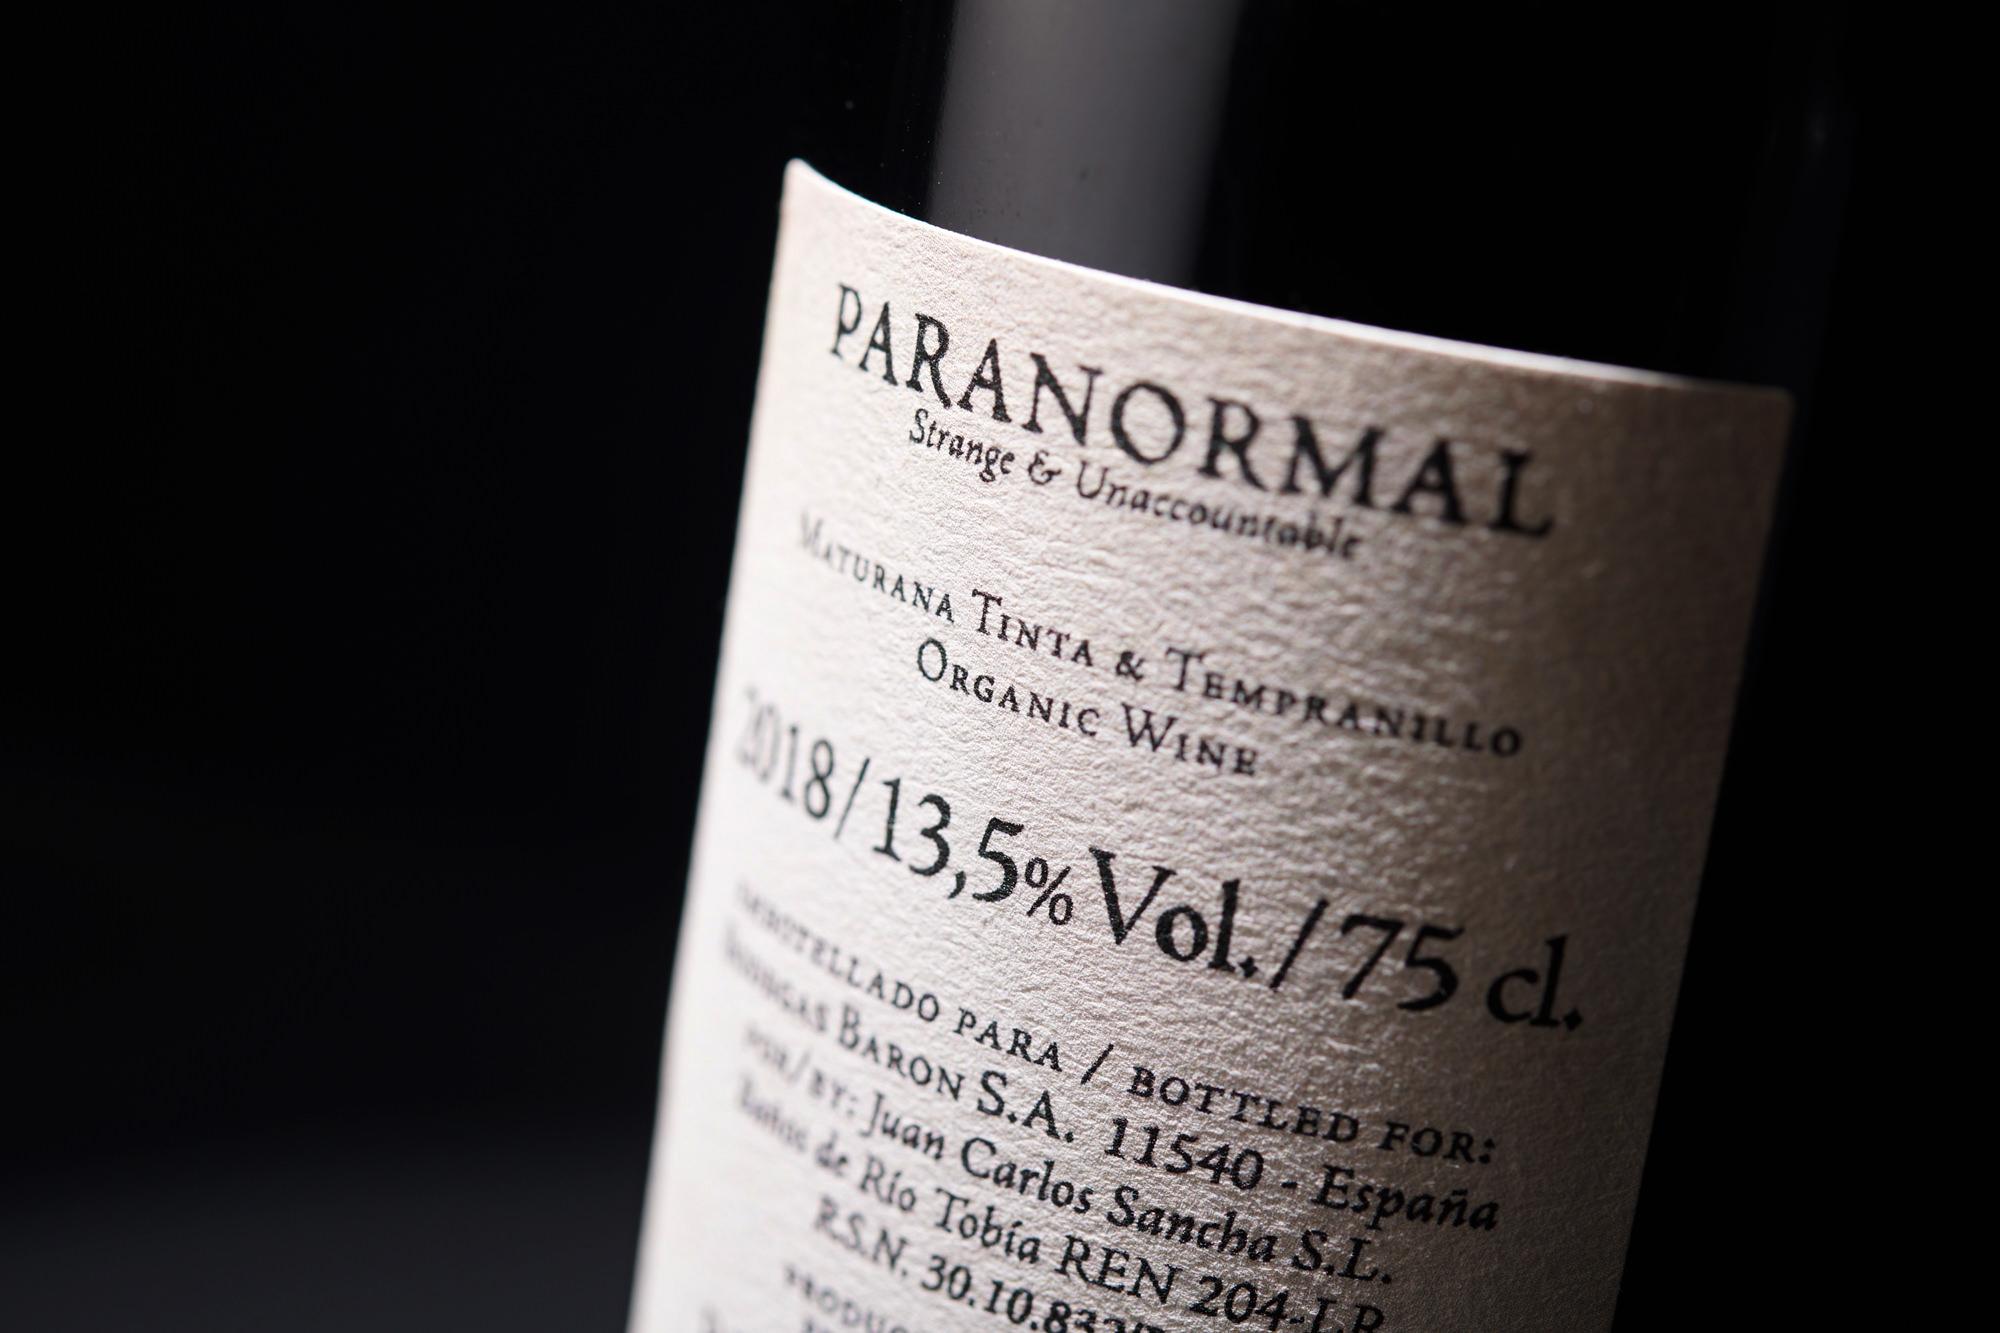 PARANORMAL14